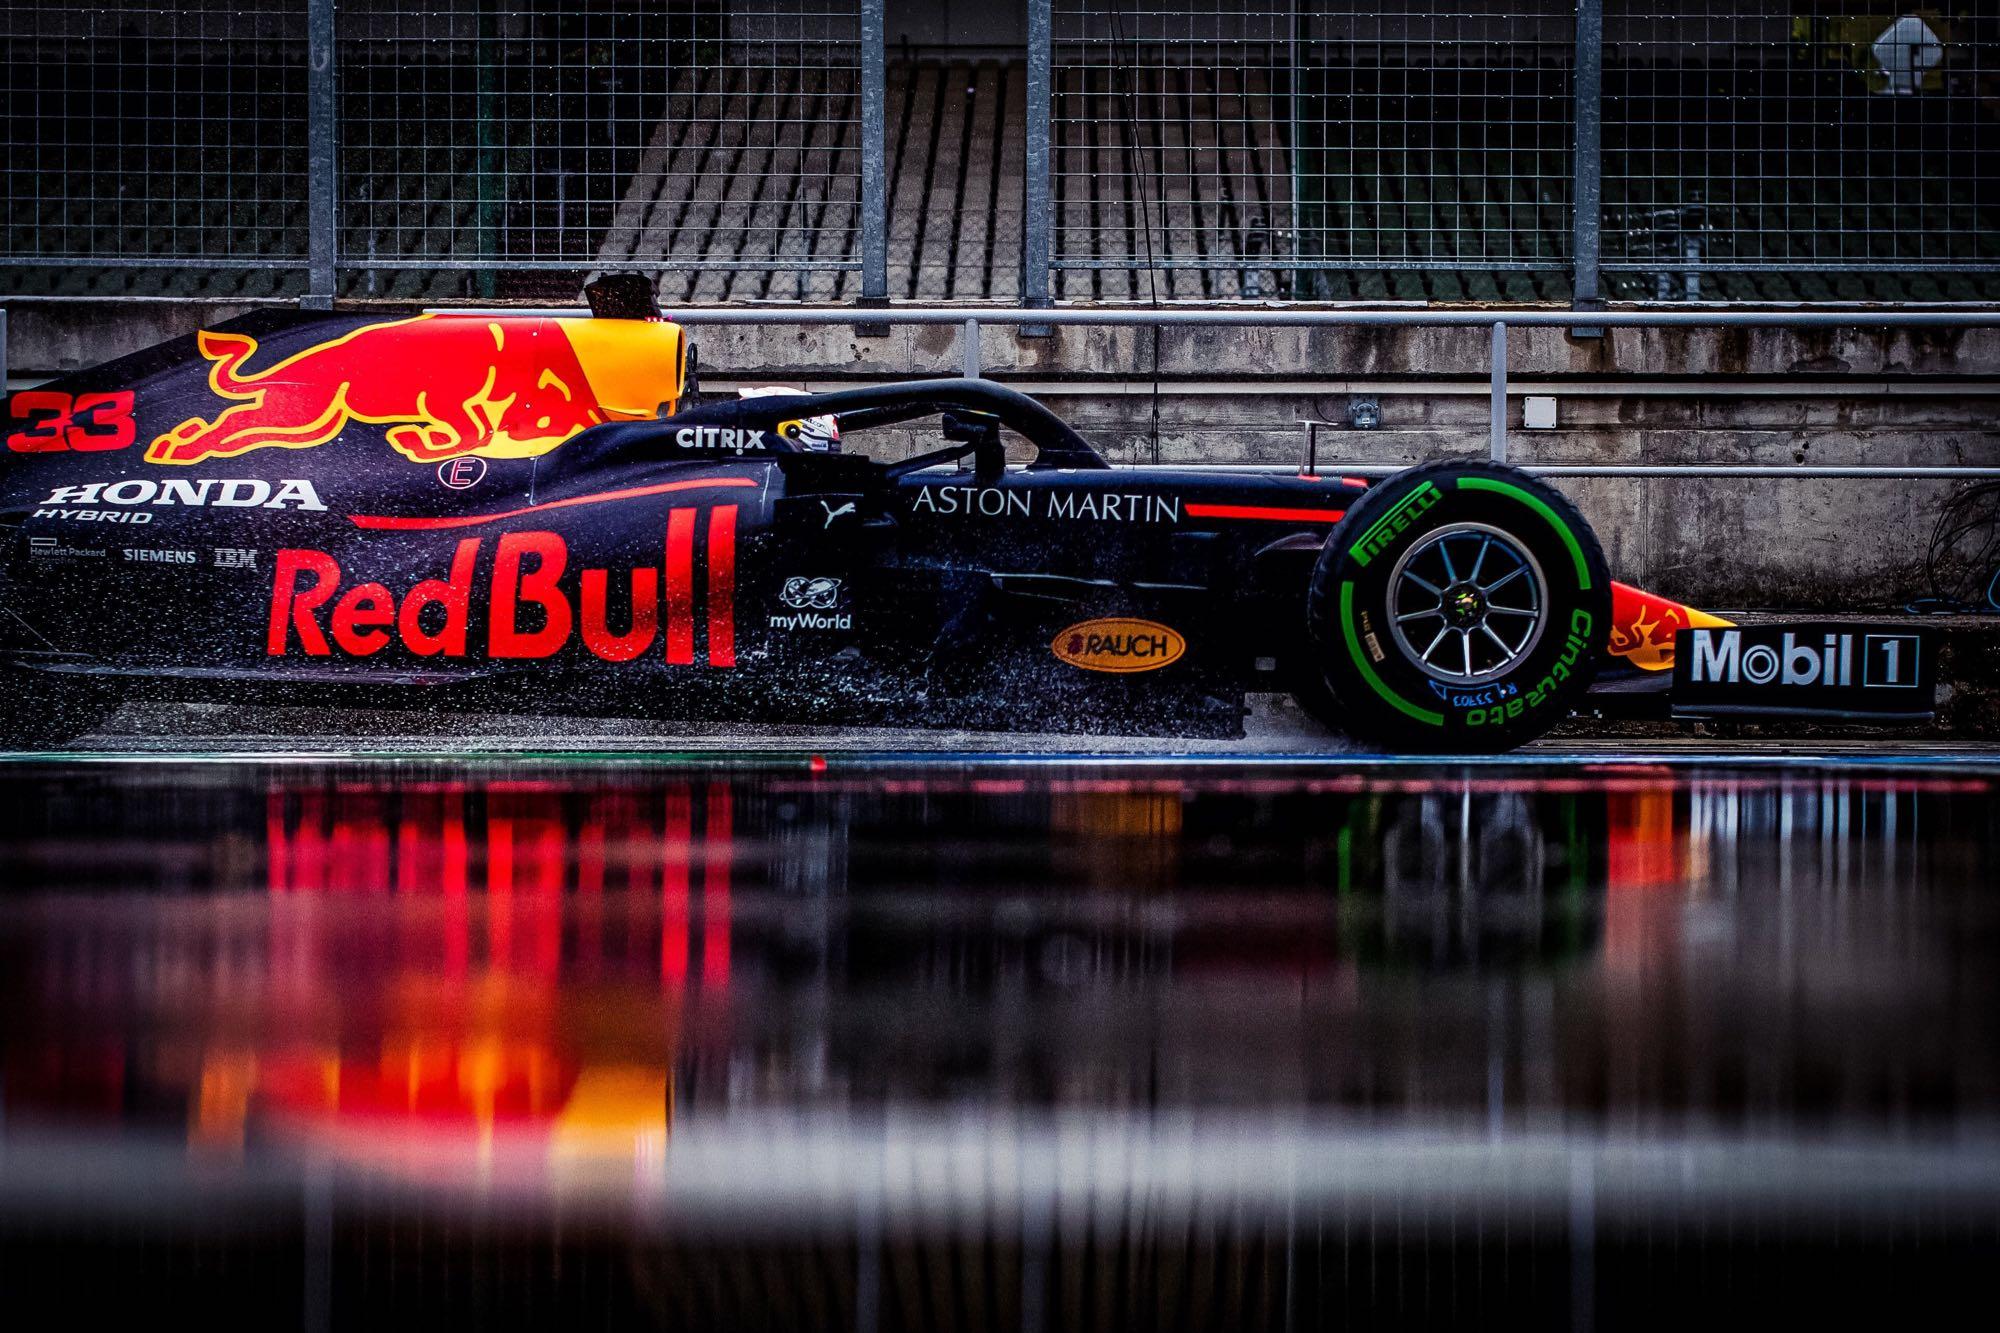 Wallpaper Red Bull Red Bull Racing Max Verstappen Aston Martin Honda Mobil 1 2000x1333 Garett 1948547 Hd Wallpapers Wallhere